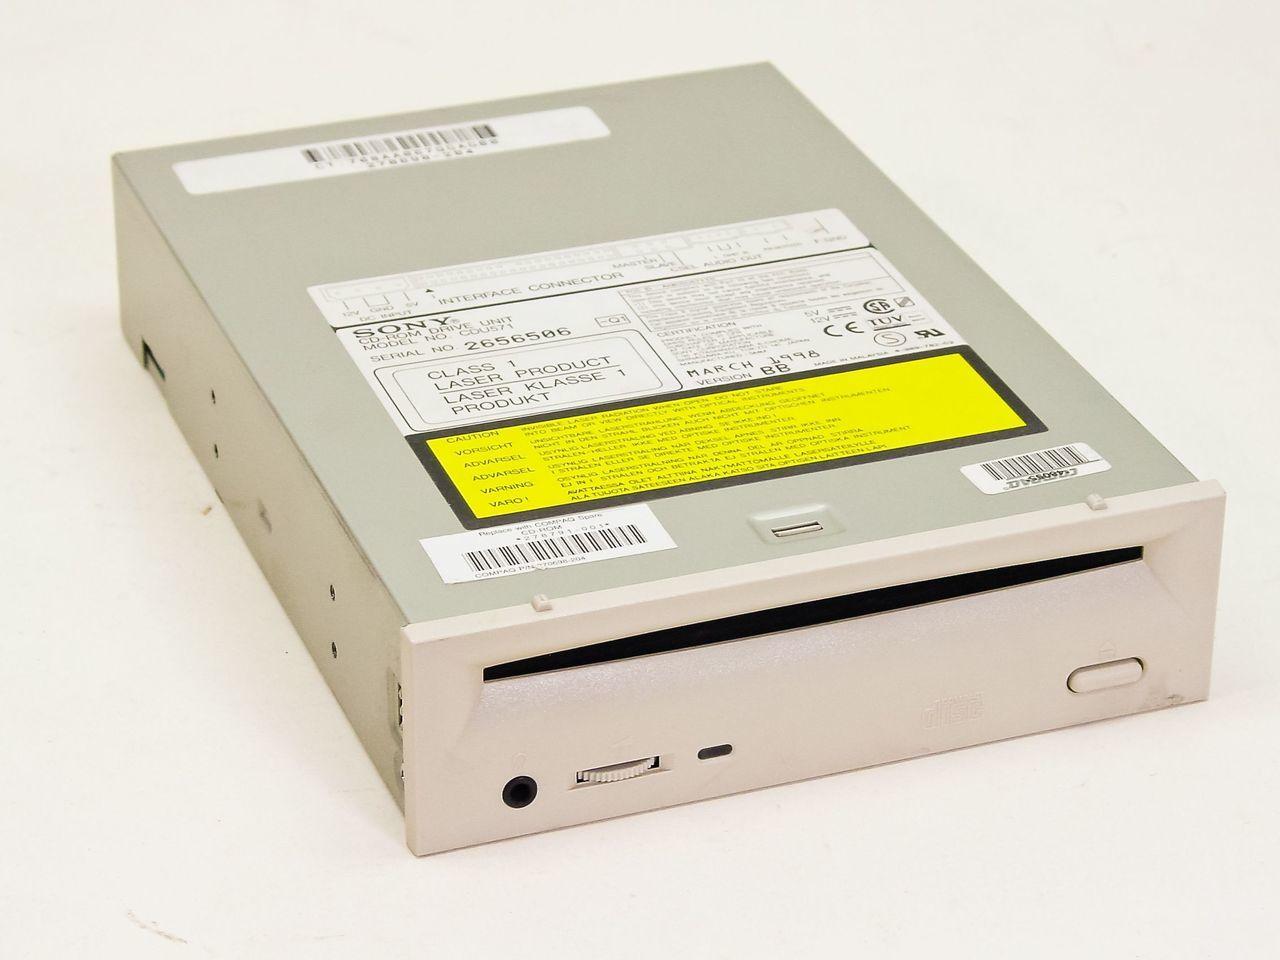 271138-001 Compaq CD-ROM 16X for Presario 4000, 4700 series